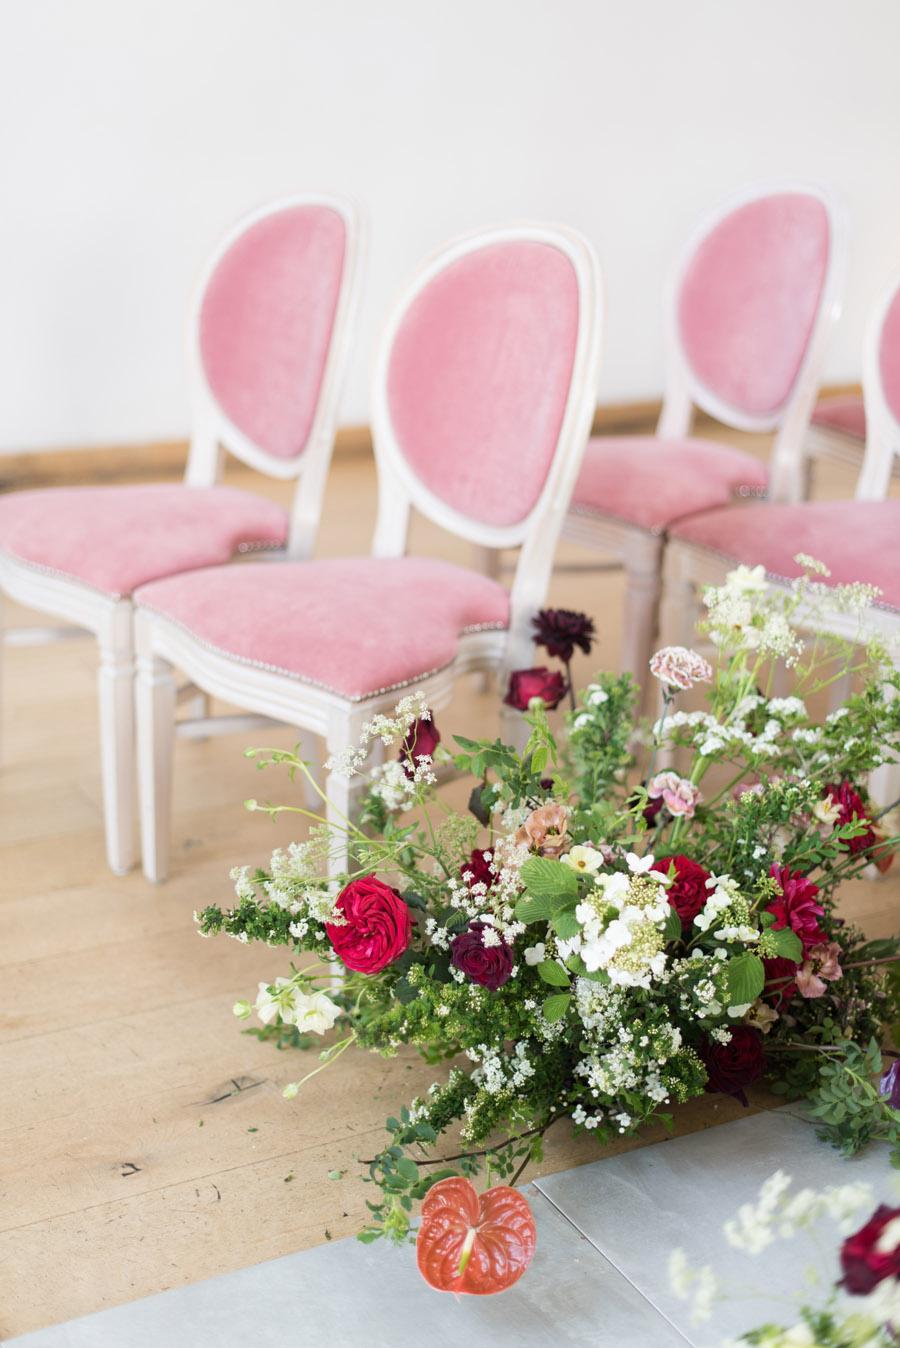 floral wedding ideas at Millbridge Court on English Wedding - photo credit Julie Michaelsen Photography (14)